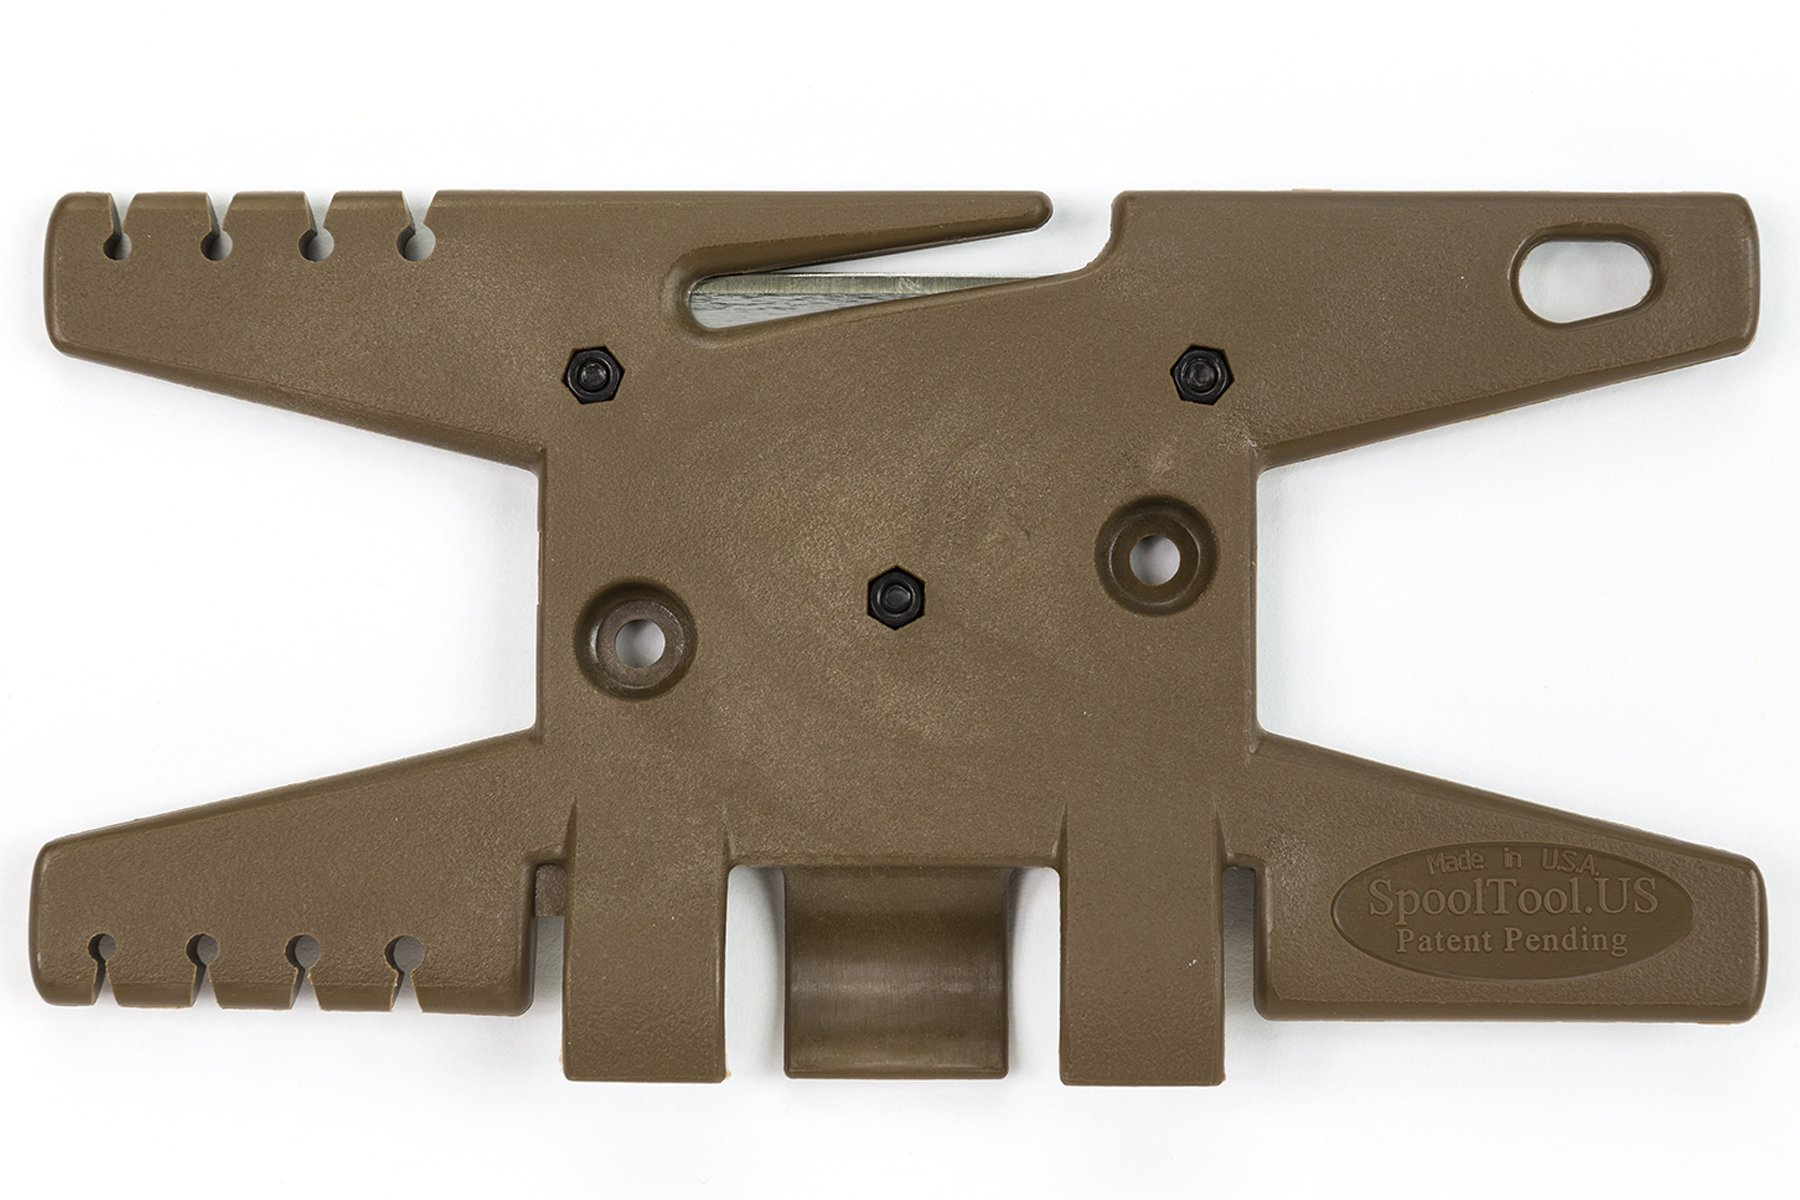 TricornE-Spool Tool-Multifunctional Paracord Device